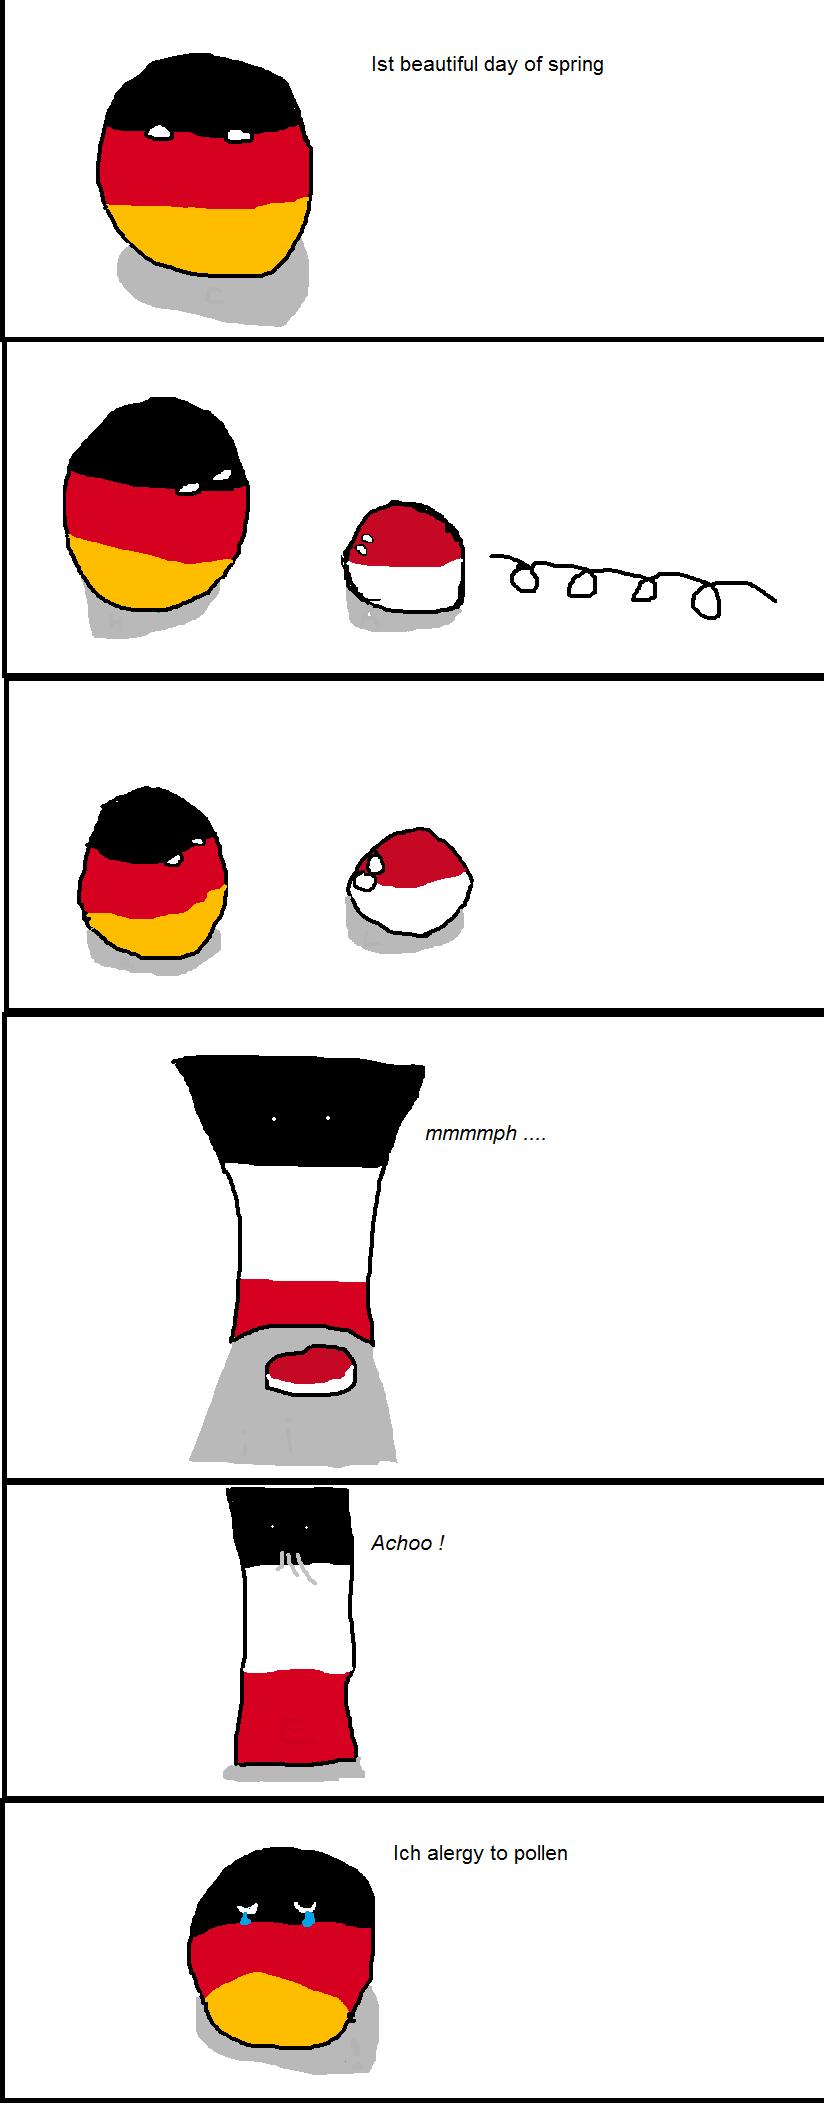 German spring.